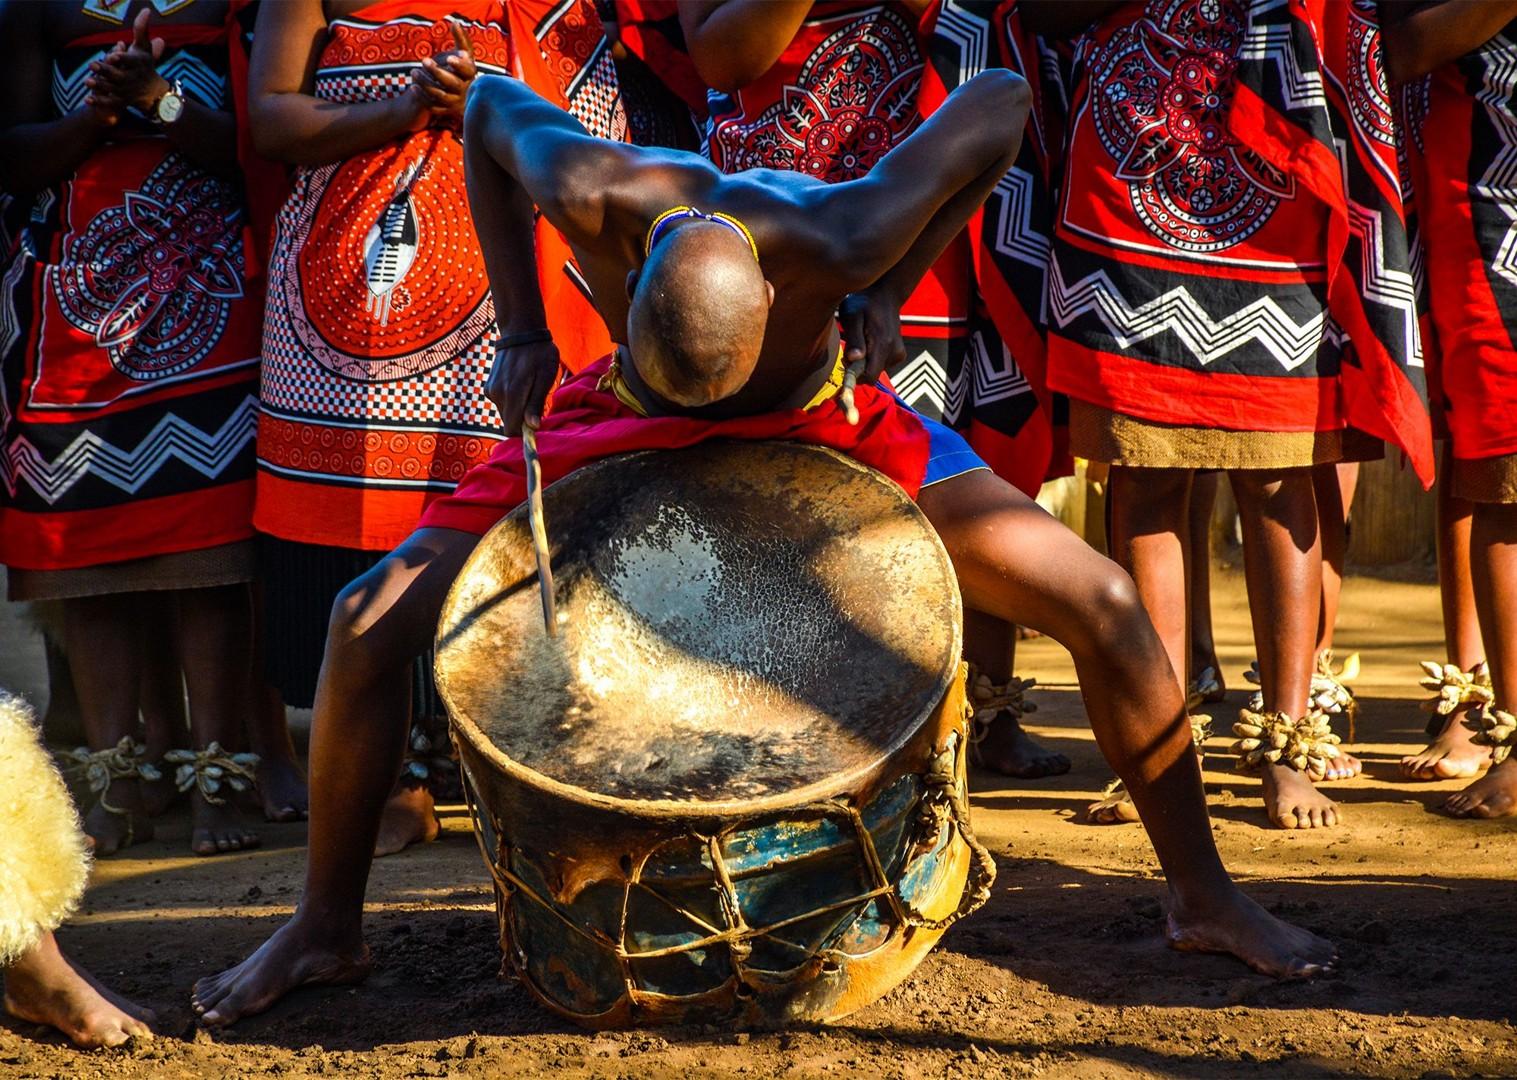 rgfdgfg11.jpg - Eswatini (Swaziland) - Cycling Safari - Cycling Adventures